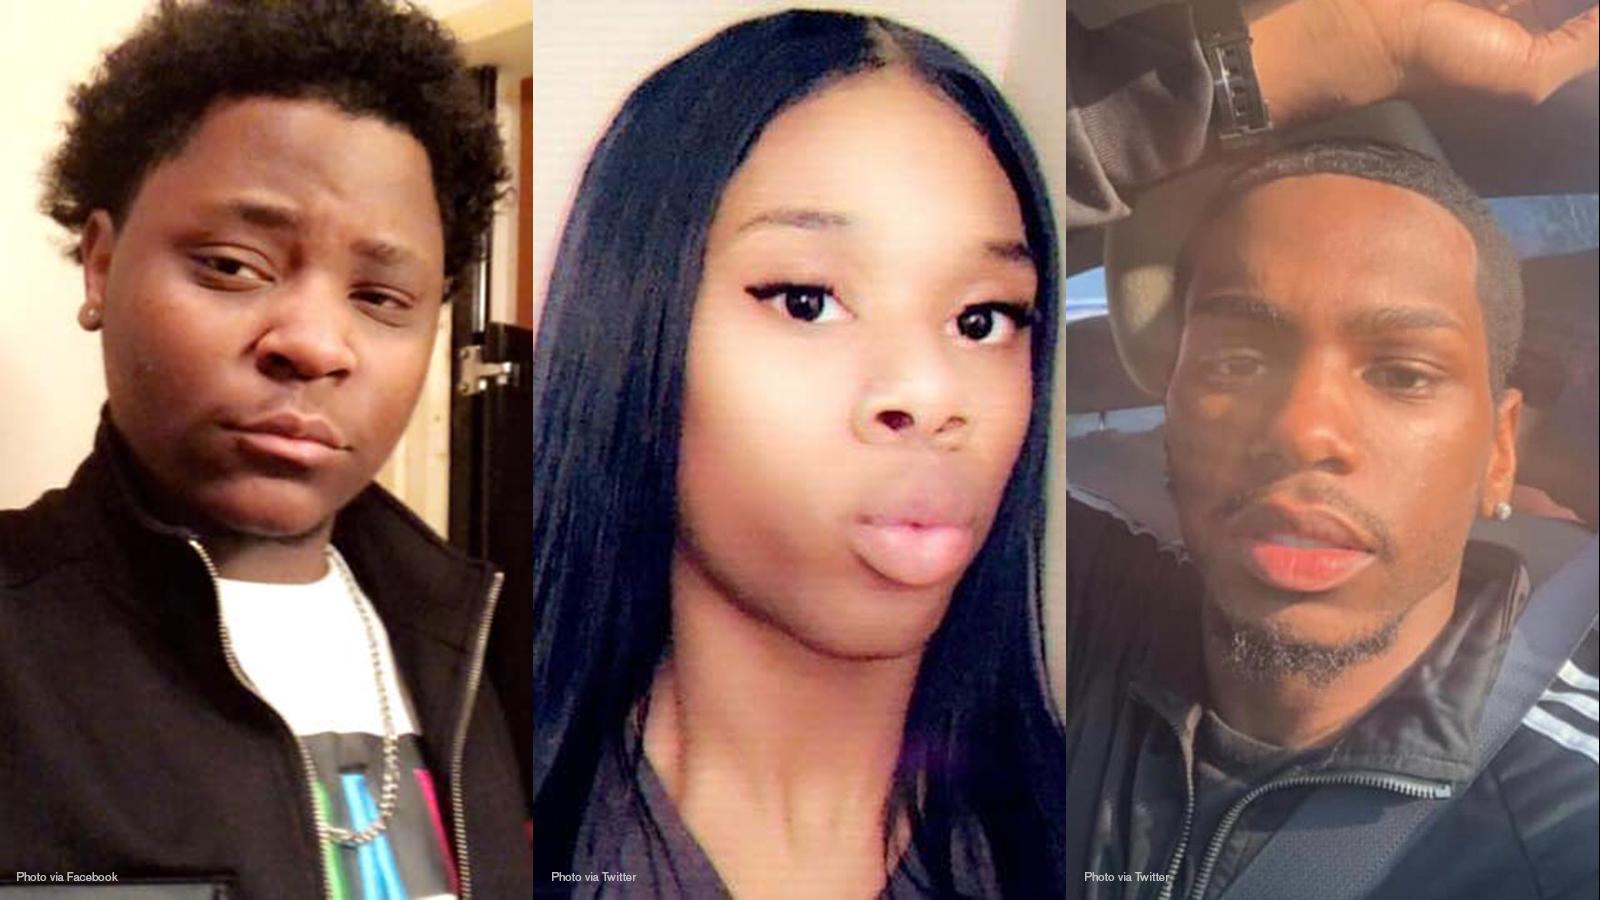 Horrific Anti-LGBTQ Killings in Detroit Demand Action